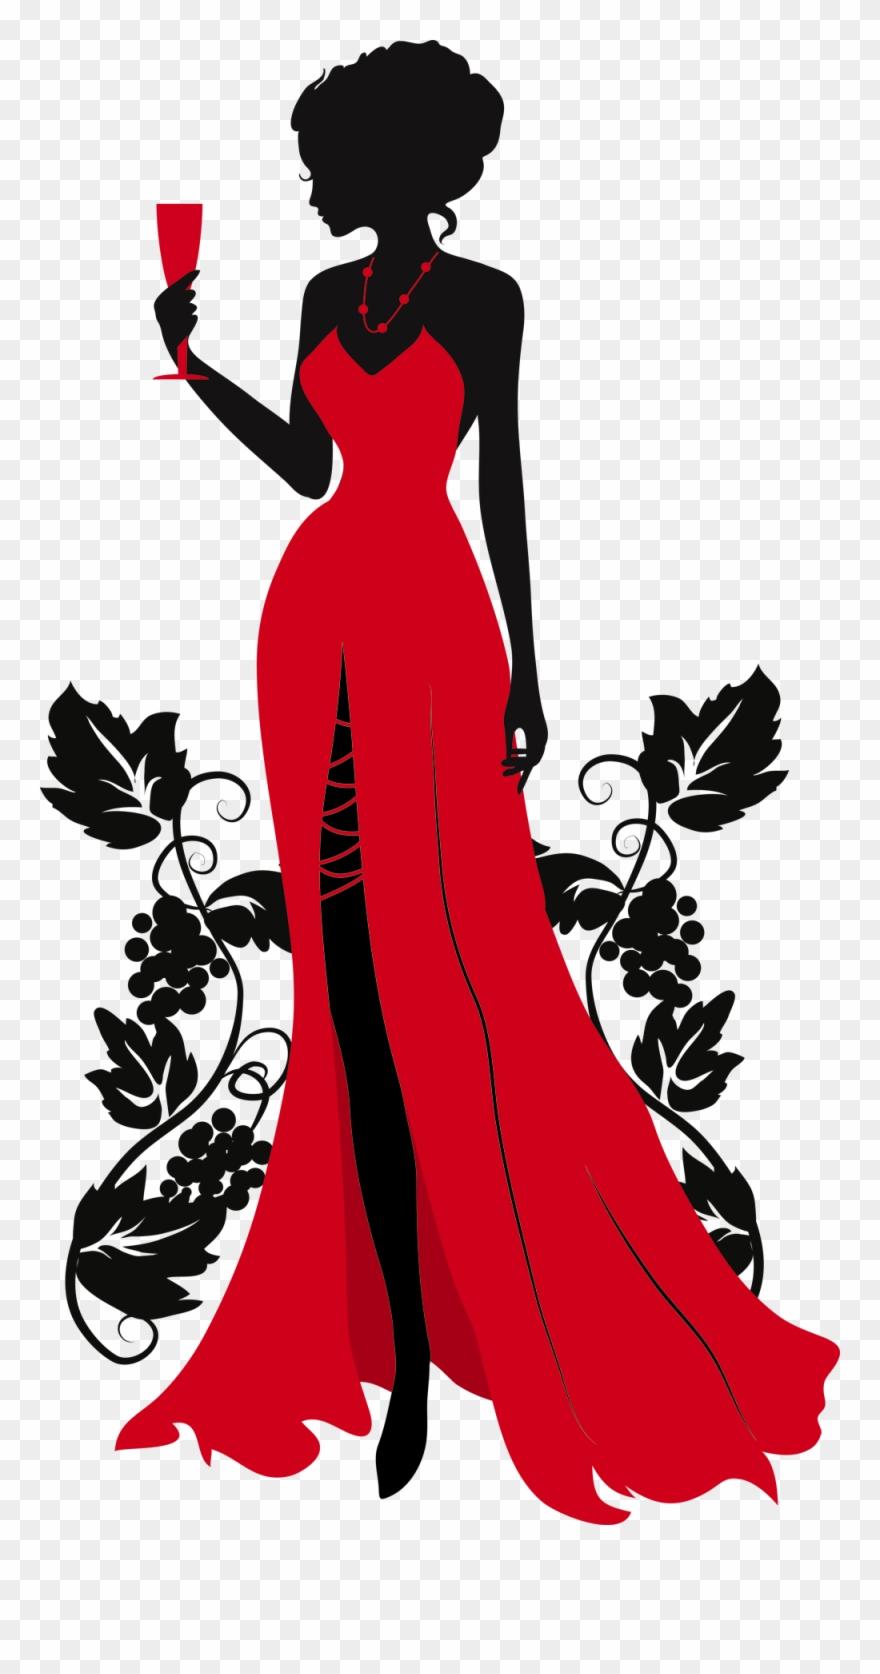 Woman Silhouette, Vintage Silhouette, Silhouette Art.